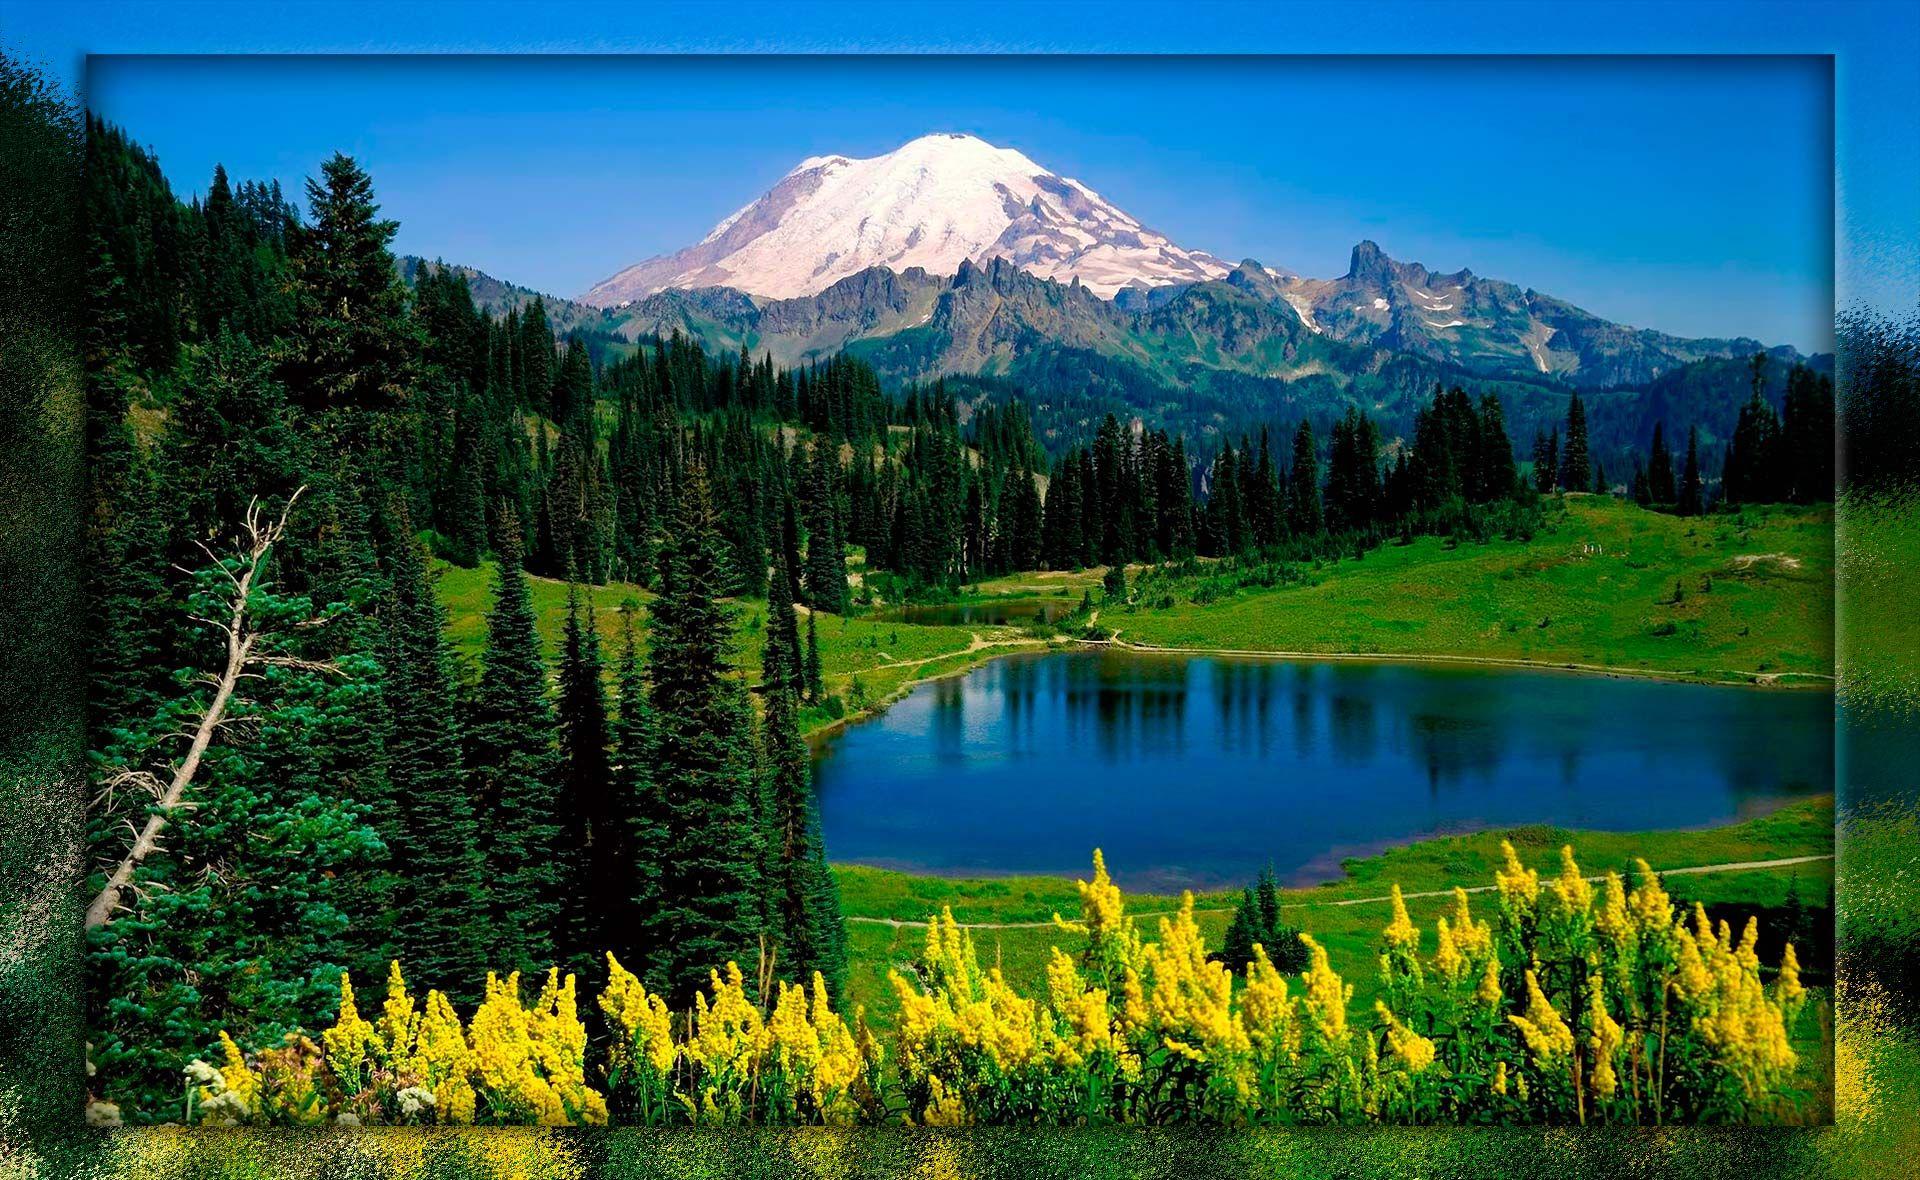 Fondo pantalla paisaje bonito bosque dios fondo animado for Imagenes de fondo de pantalla bonitos